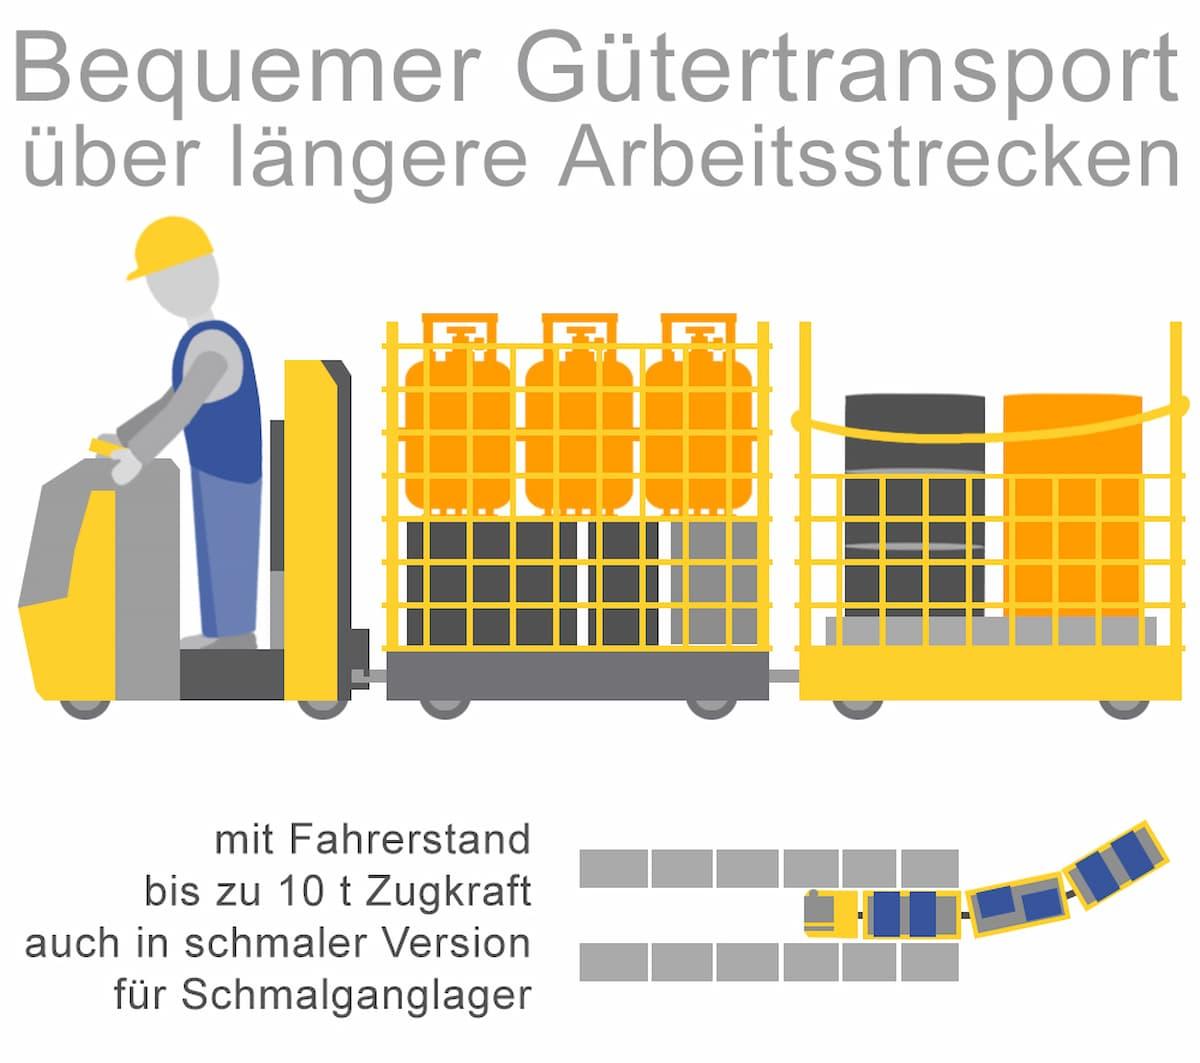 Bequemer Gütertransport über längere Arbeitsstrecken